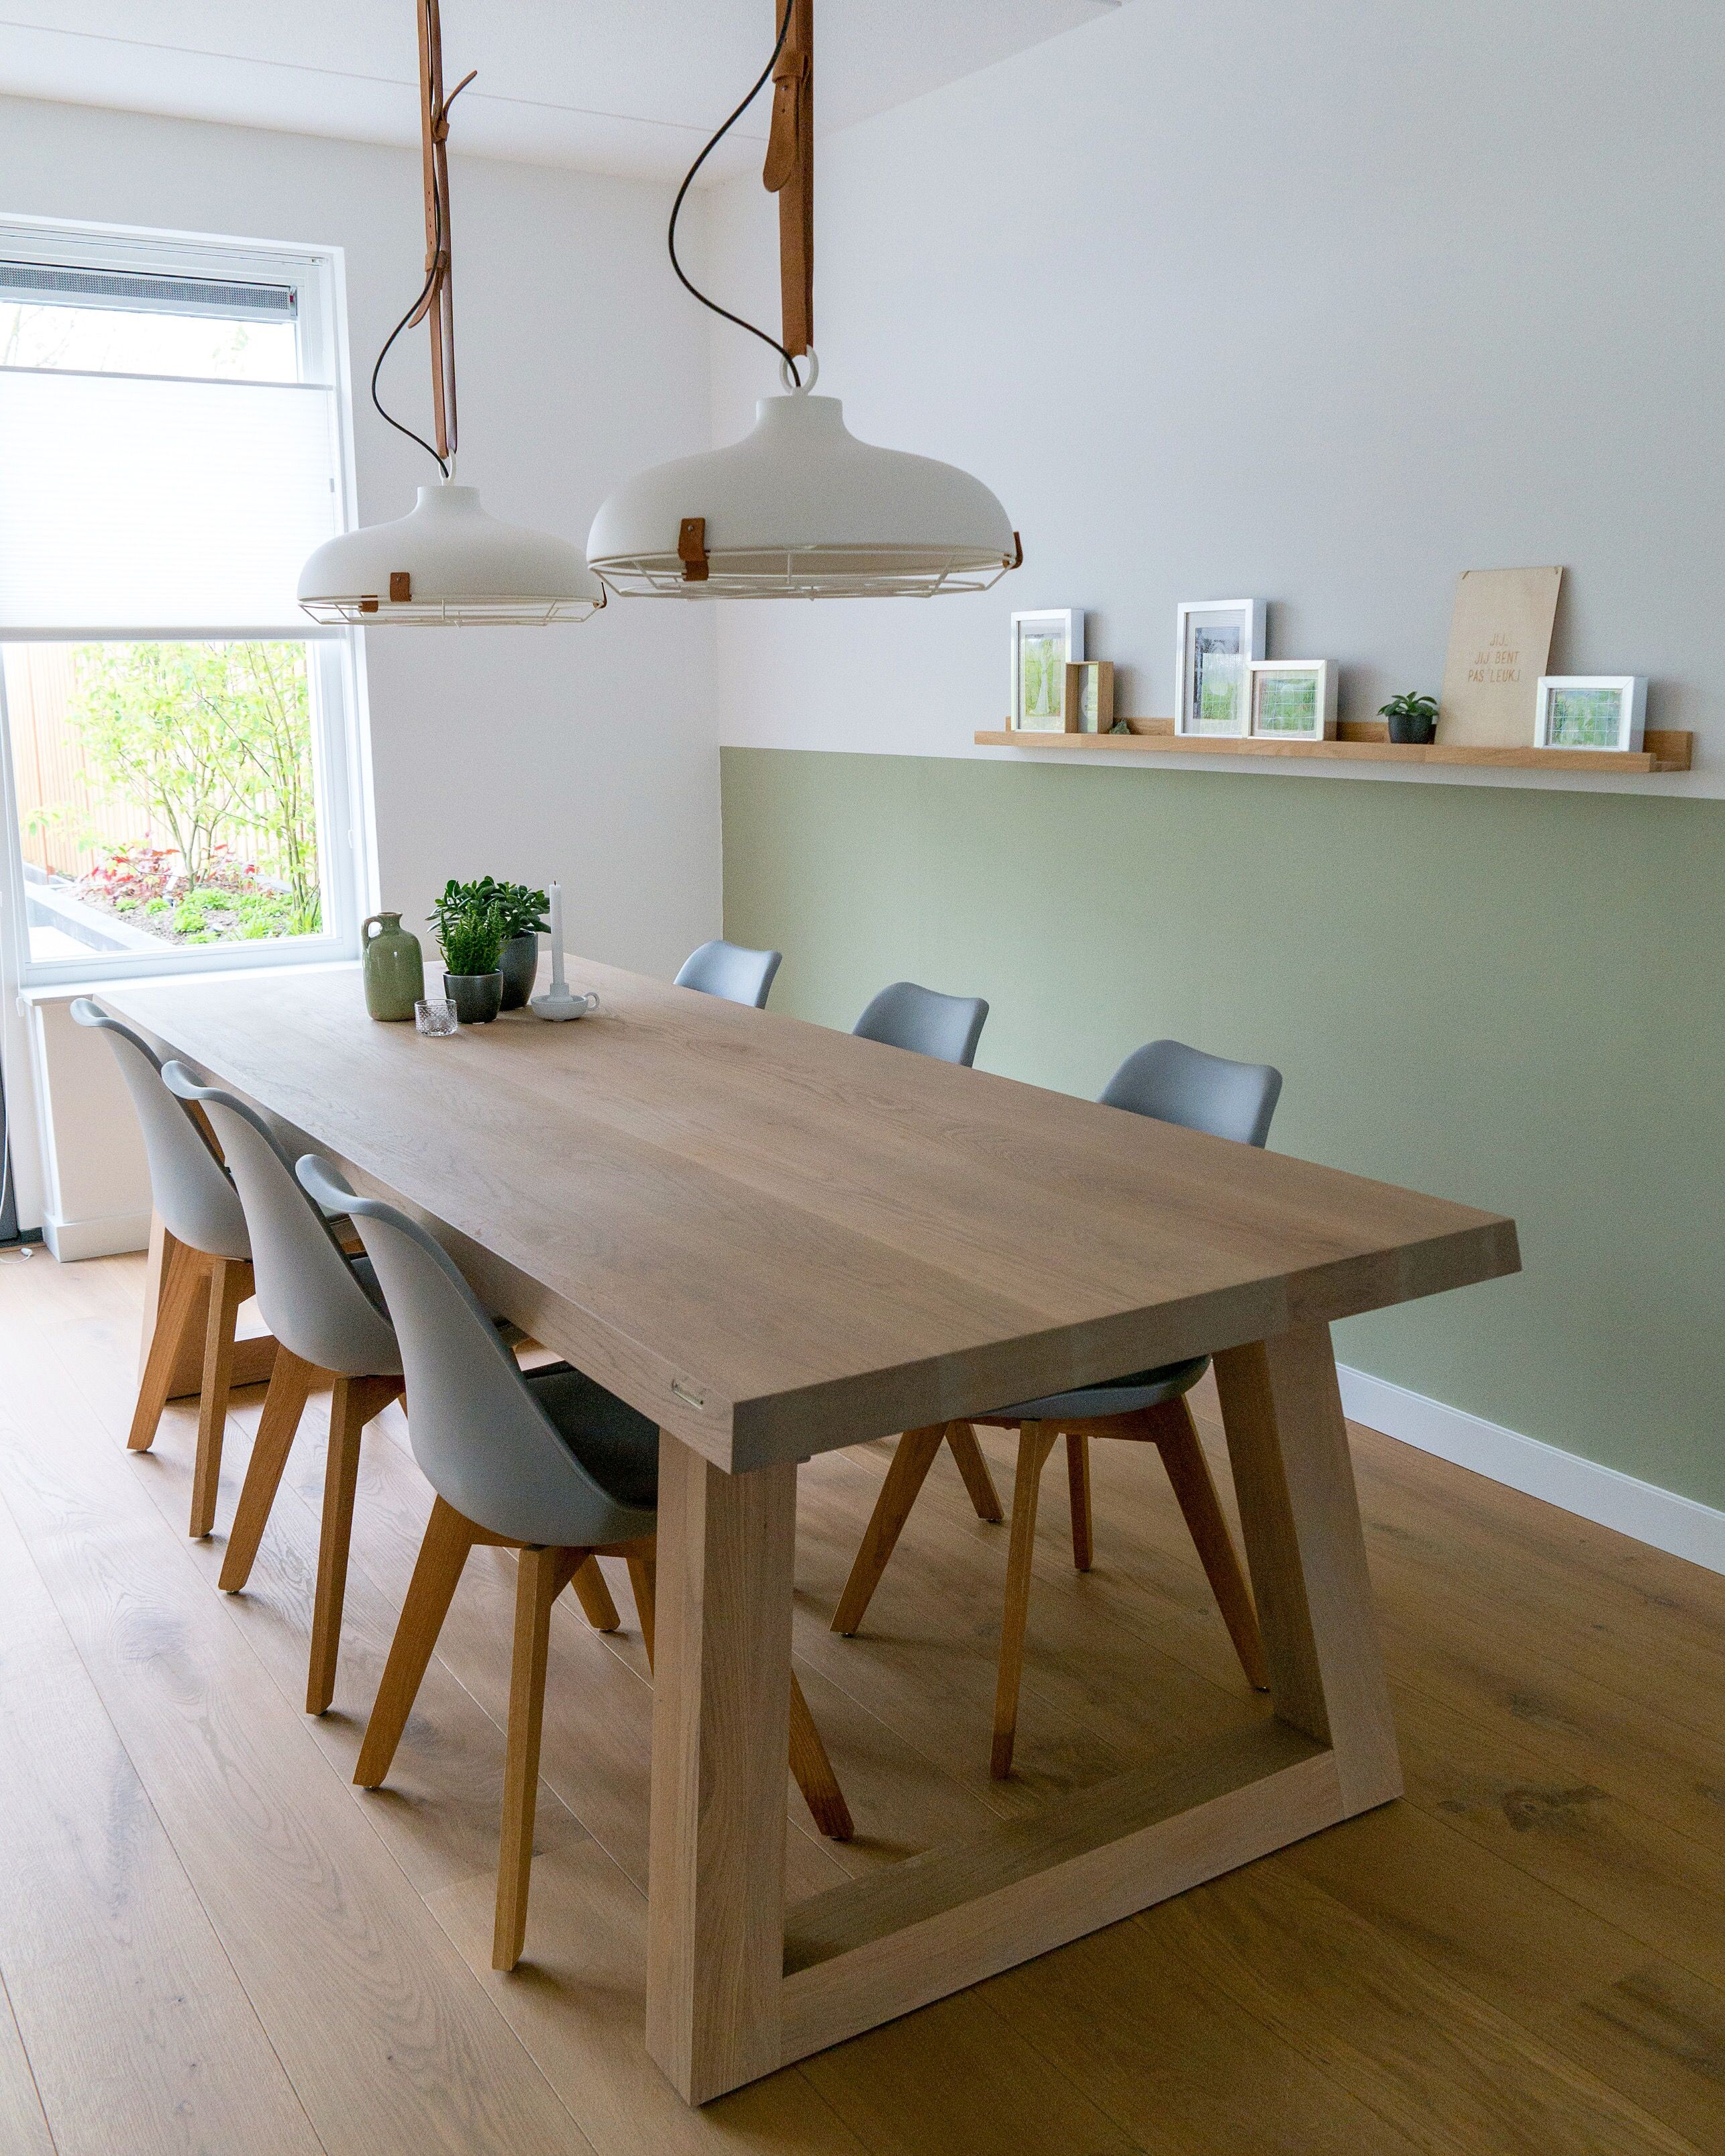 Moderne Eikenhouten Eettafel.Fairwood B V Kitches In 2019 Tafel Met Stoelen Eiken